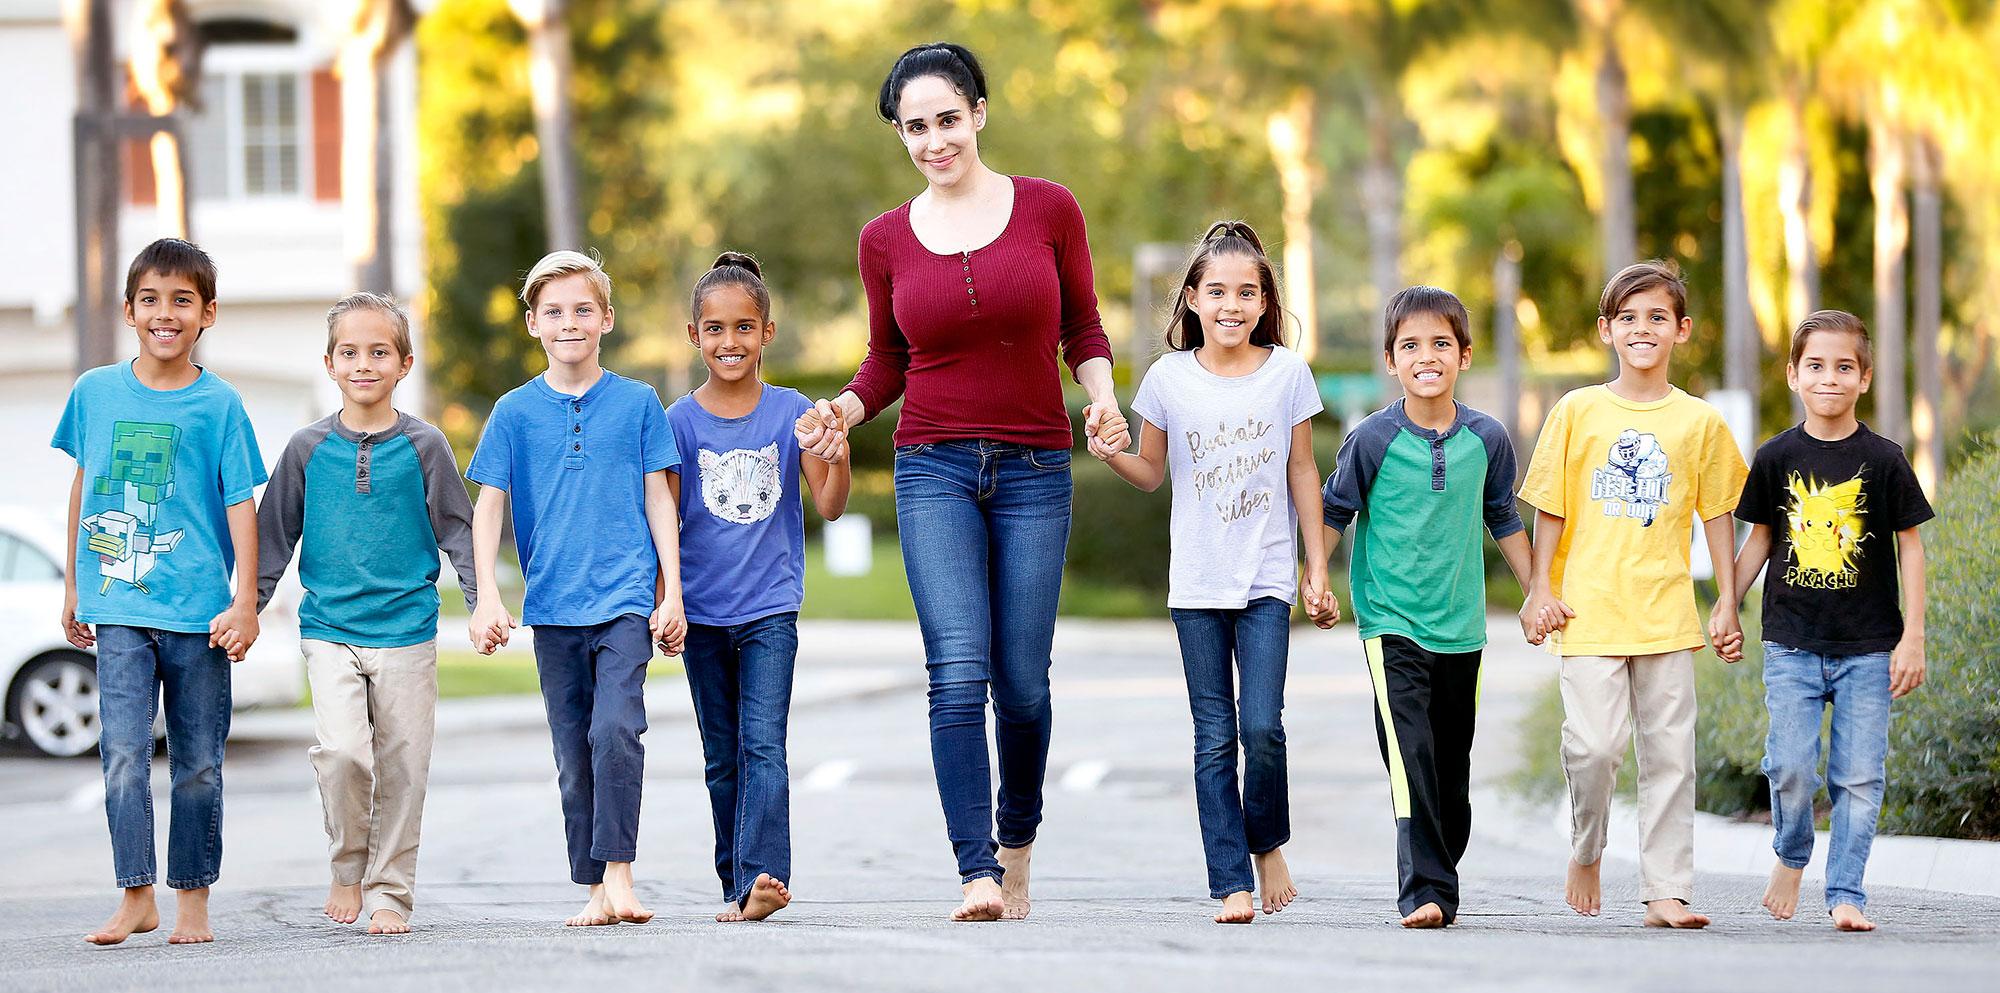 Octomom' Nadya Suleman's Kids Today: See Her 14 Children Now